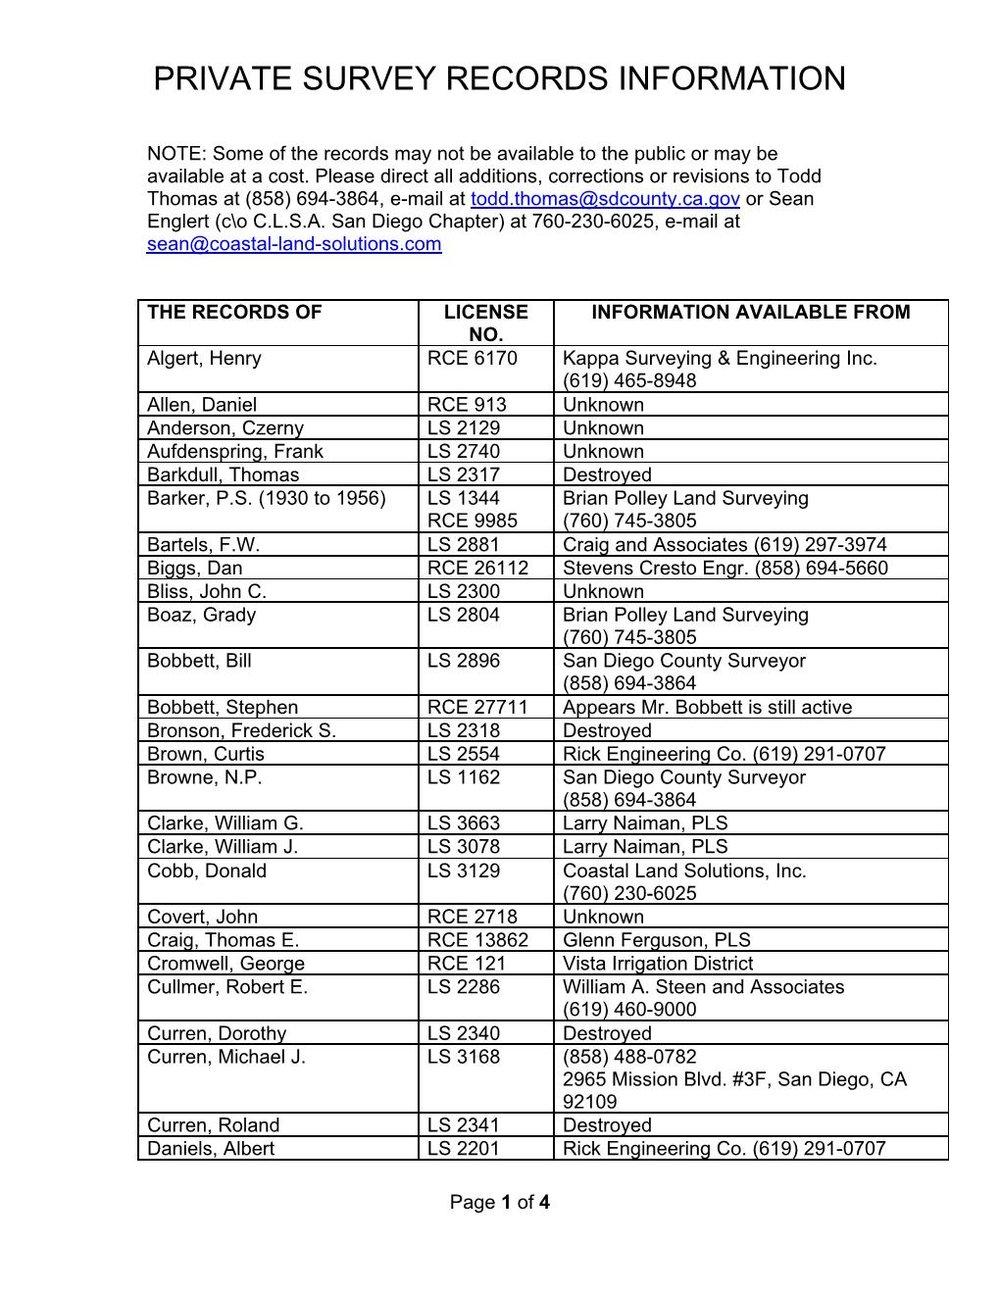 Private Survey Records Index Rev 1.28.2019 JG Page 001.jpg